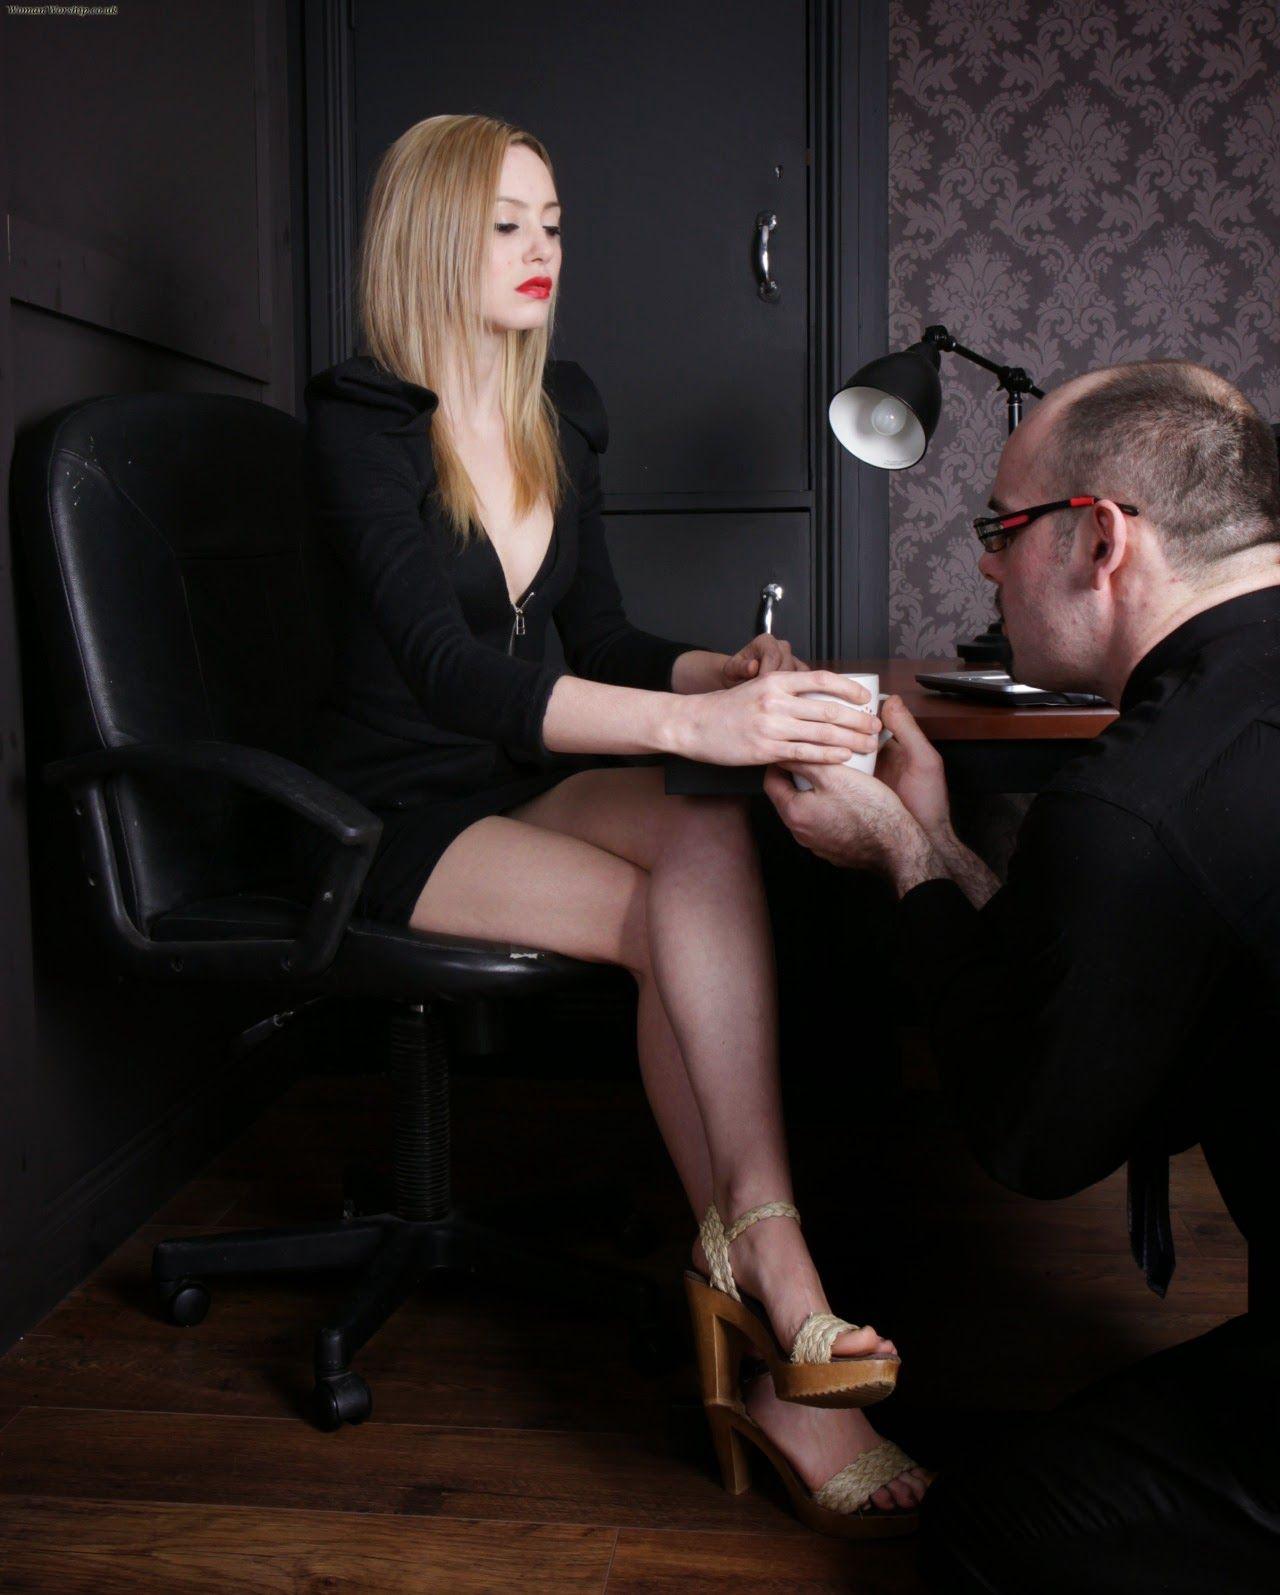 Agent 9. reccomend Femdom woman blog